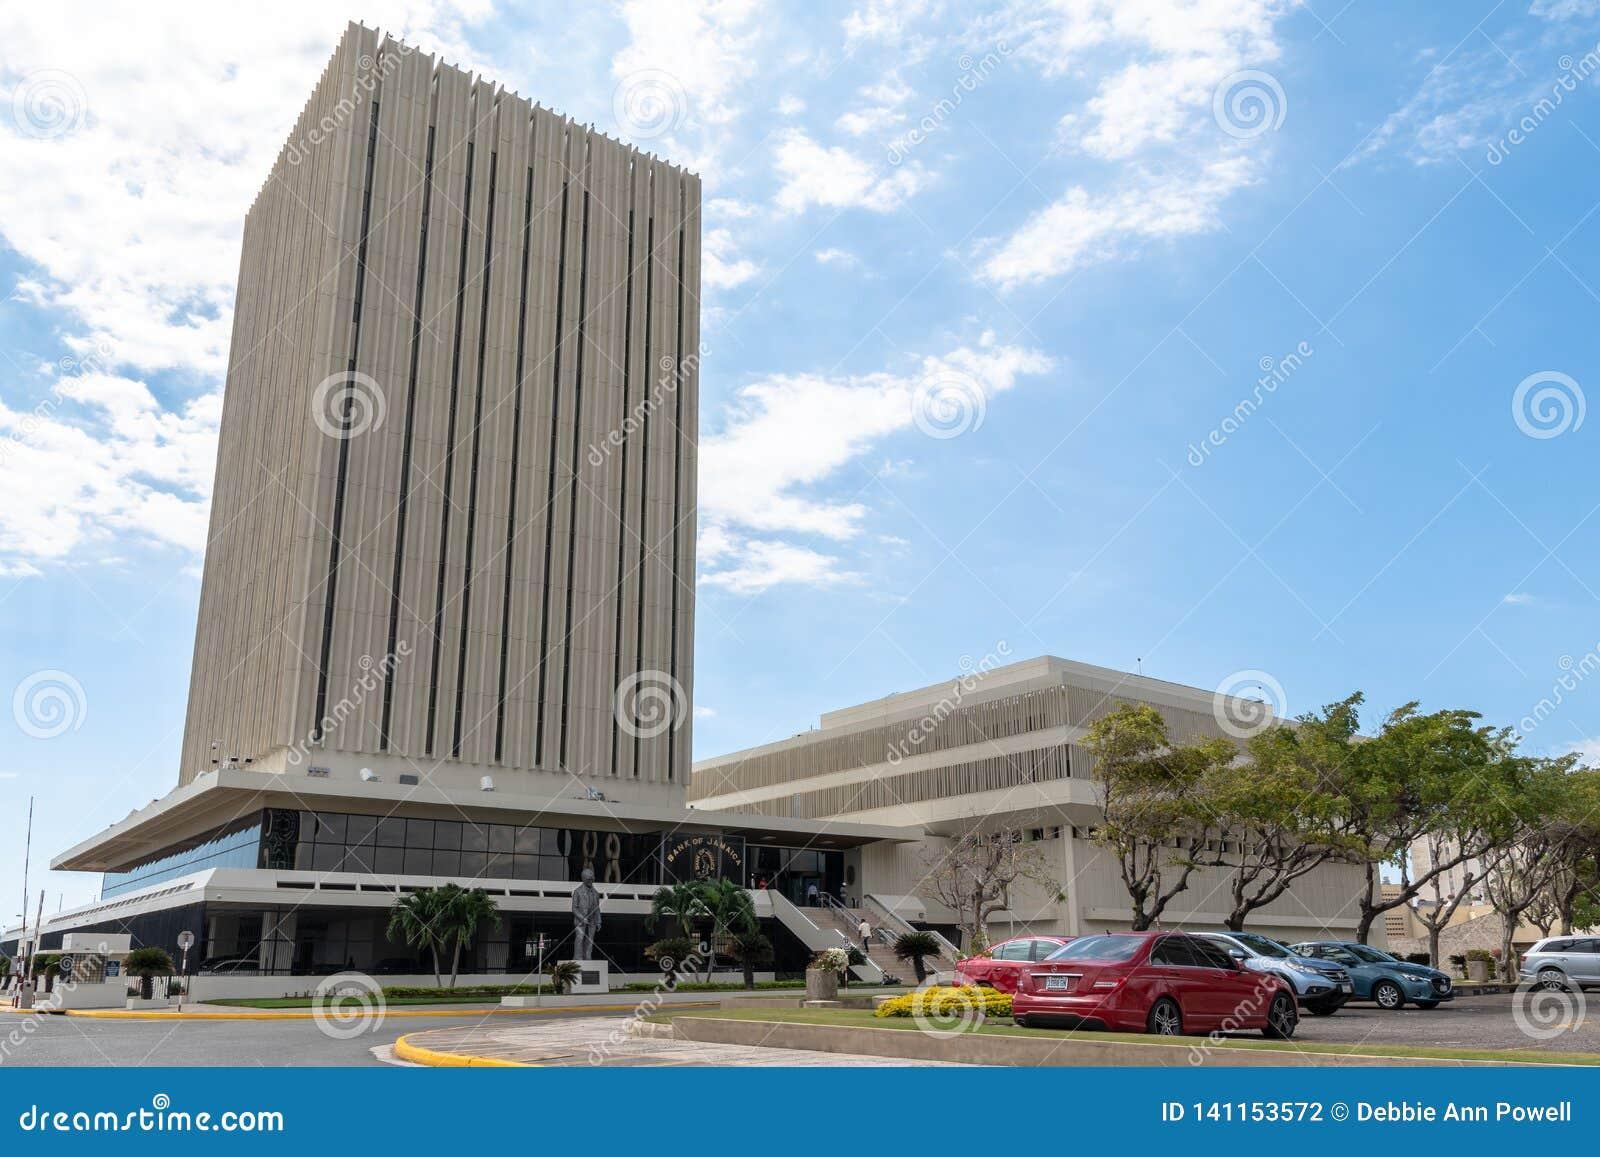 Bank Jamajka bank centralny w Jamajka